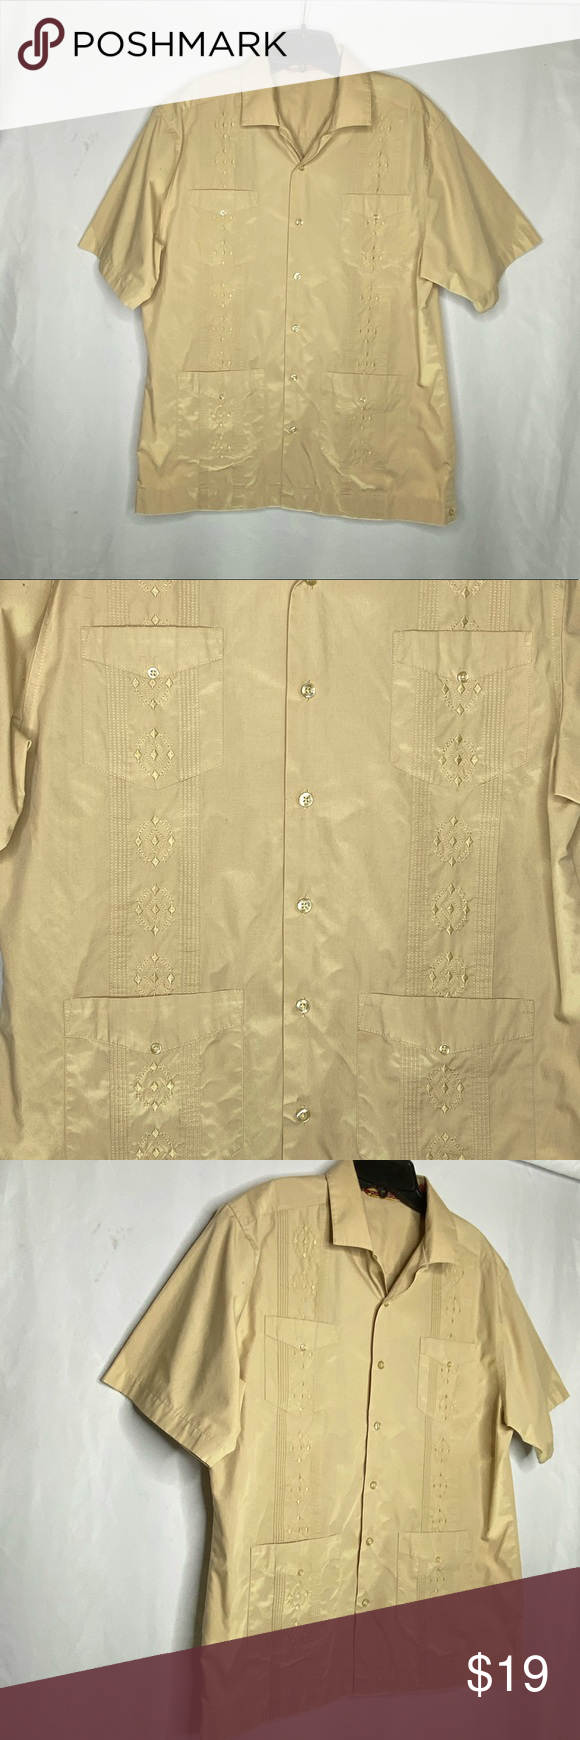 Spotted while shopping on Poshmark: Havanera Embroidered Bowling Shirt! #poshmark #fashion #shopping #style #Havanera #Other